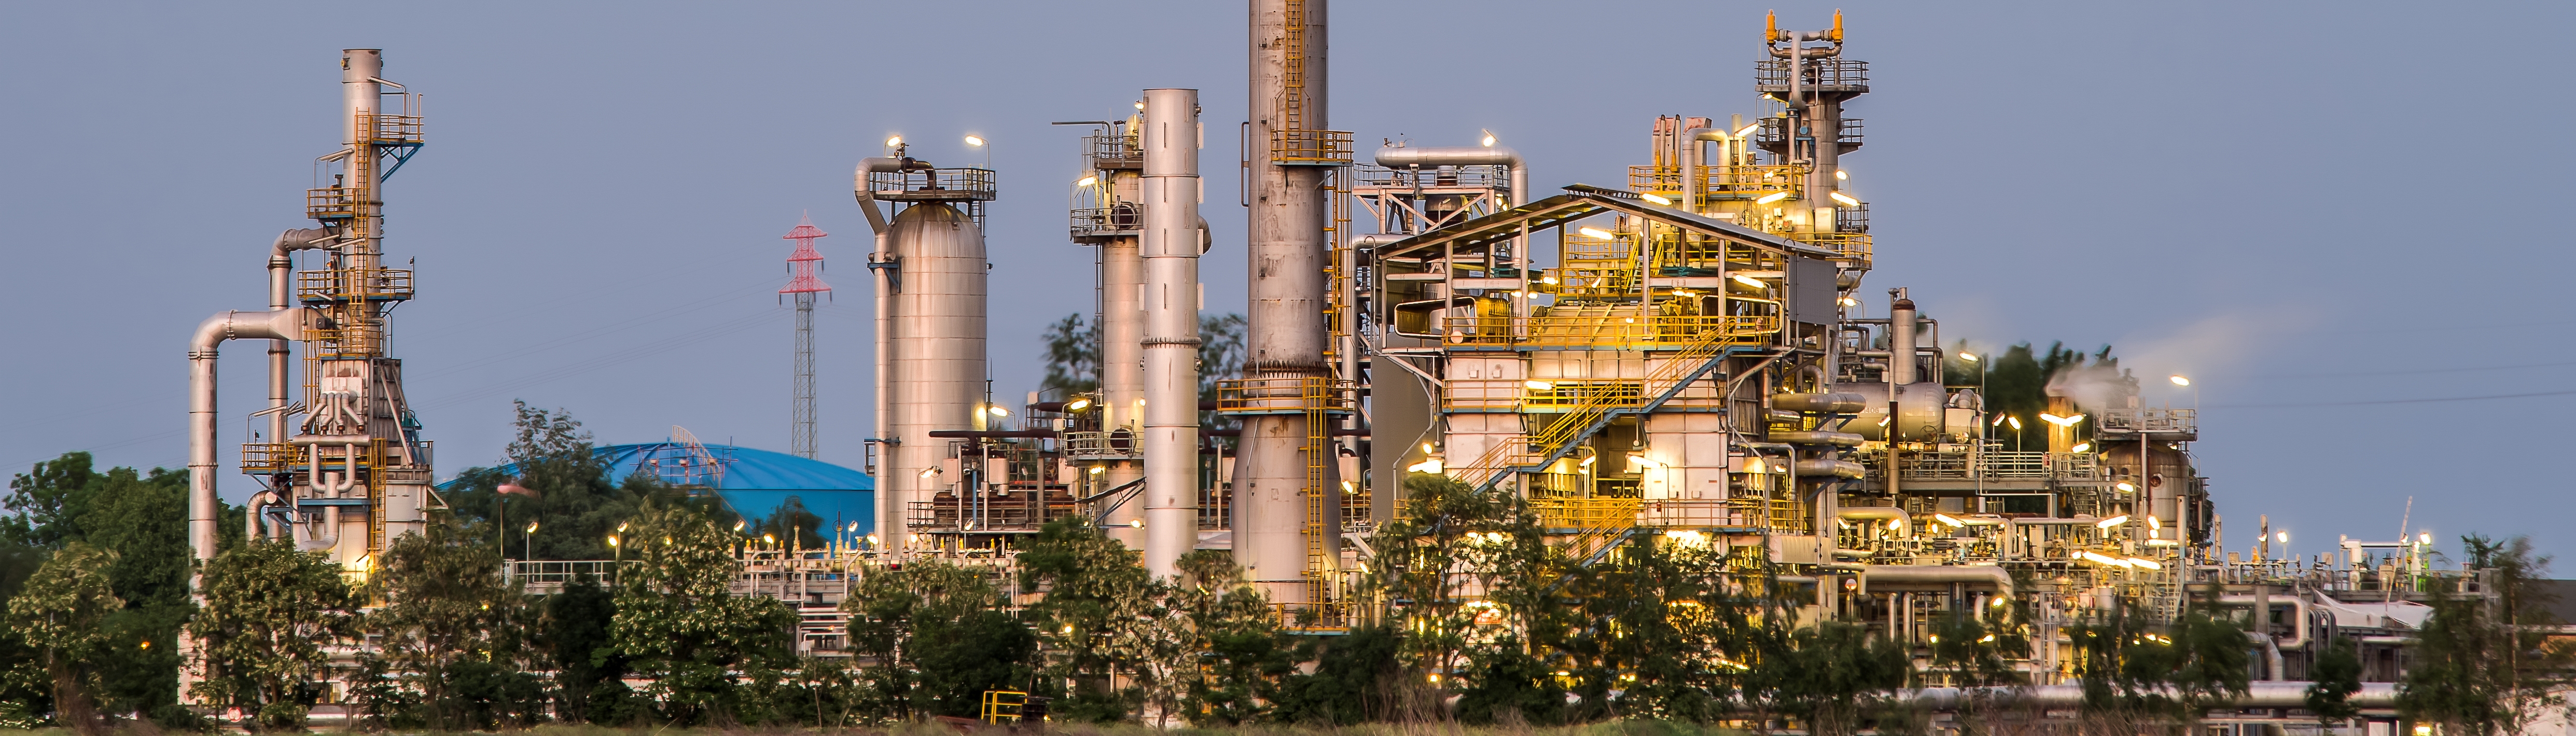 Holborn-refinery (4)